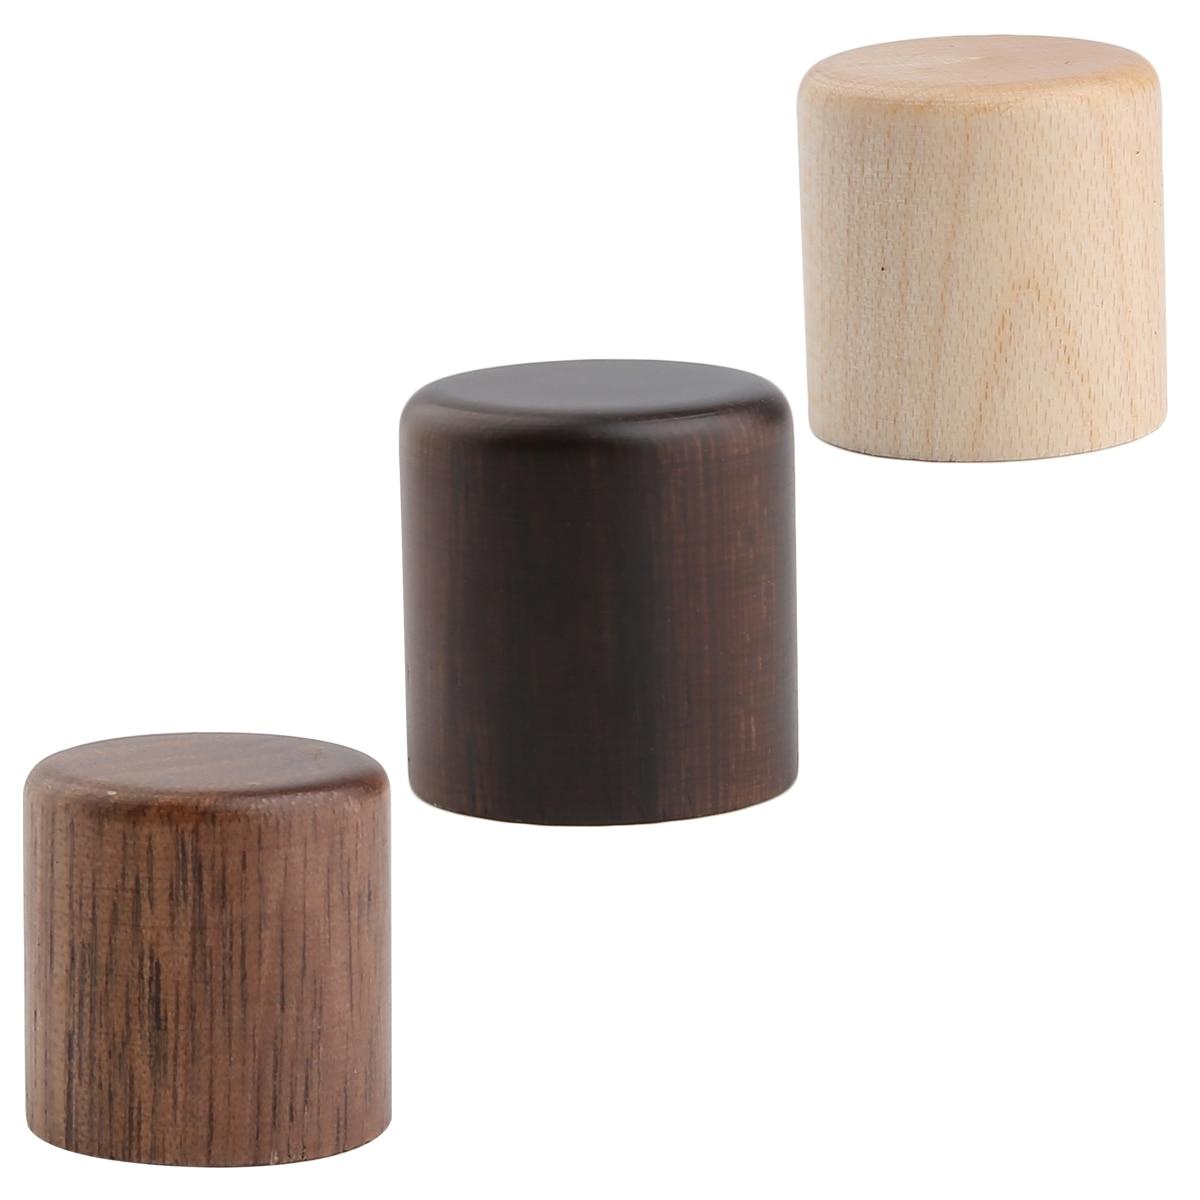 Dopro 2pcs Wood Knobs Tele Style Dome Knobs Wood Control Knobs Guitar Bass Wood Barrel Knobs Maple/Rose/Walnut Wood